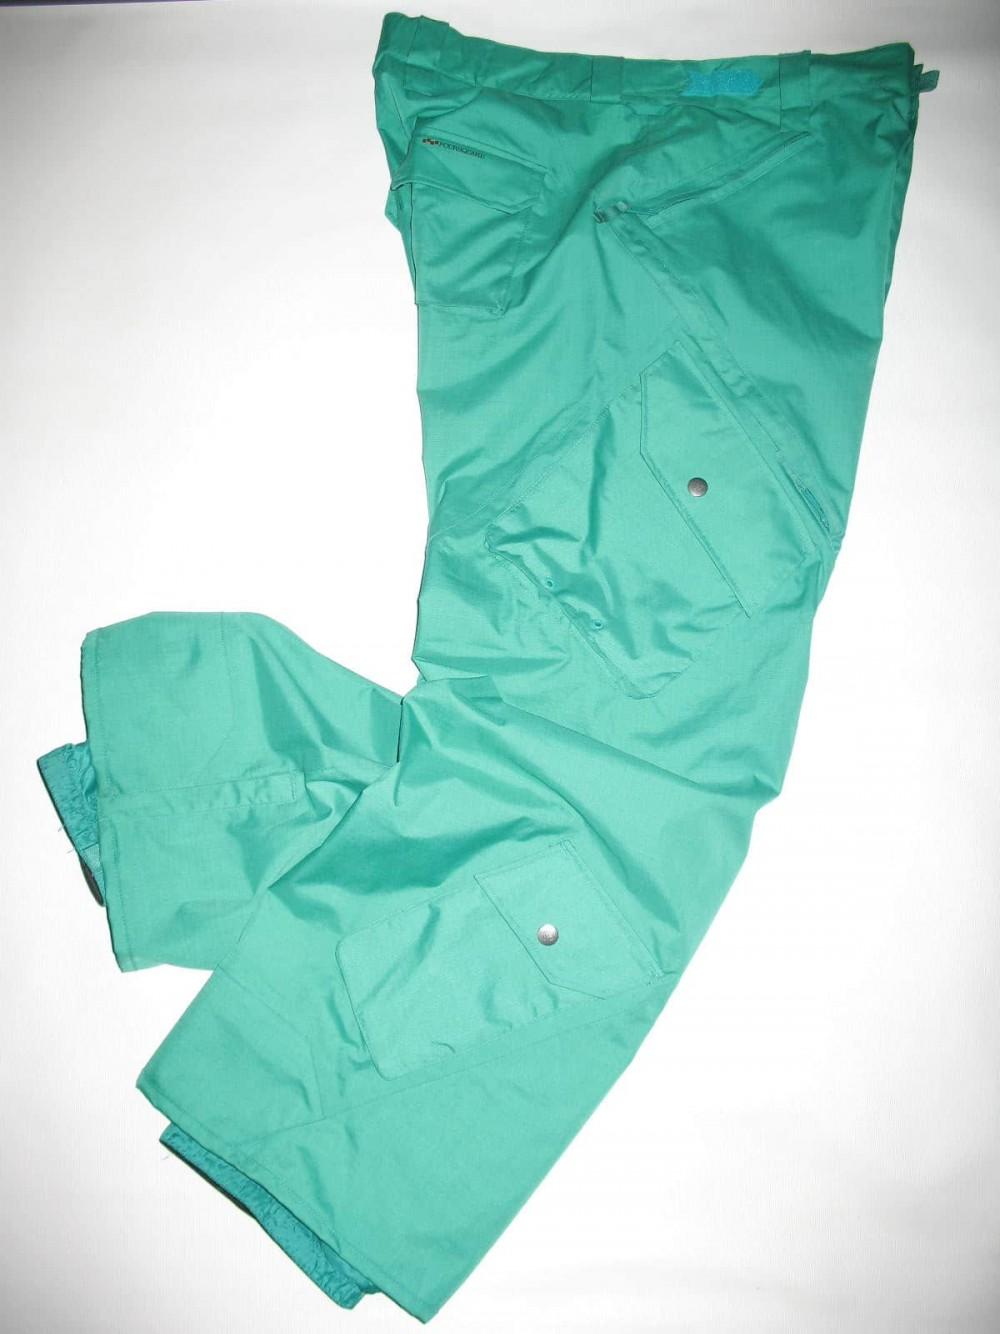 Штаны FOURSQUARE q snowboard pants (размер XL) - 4